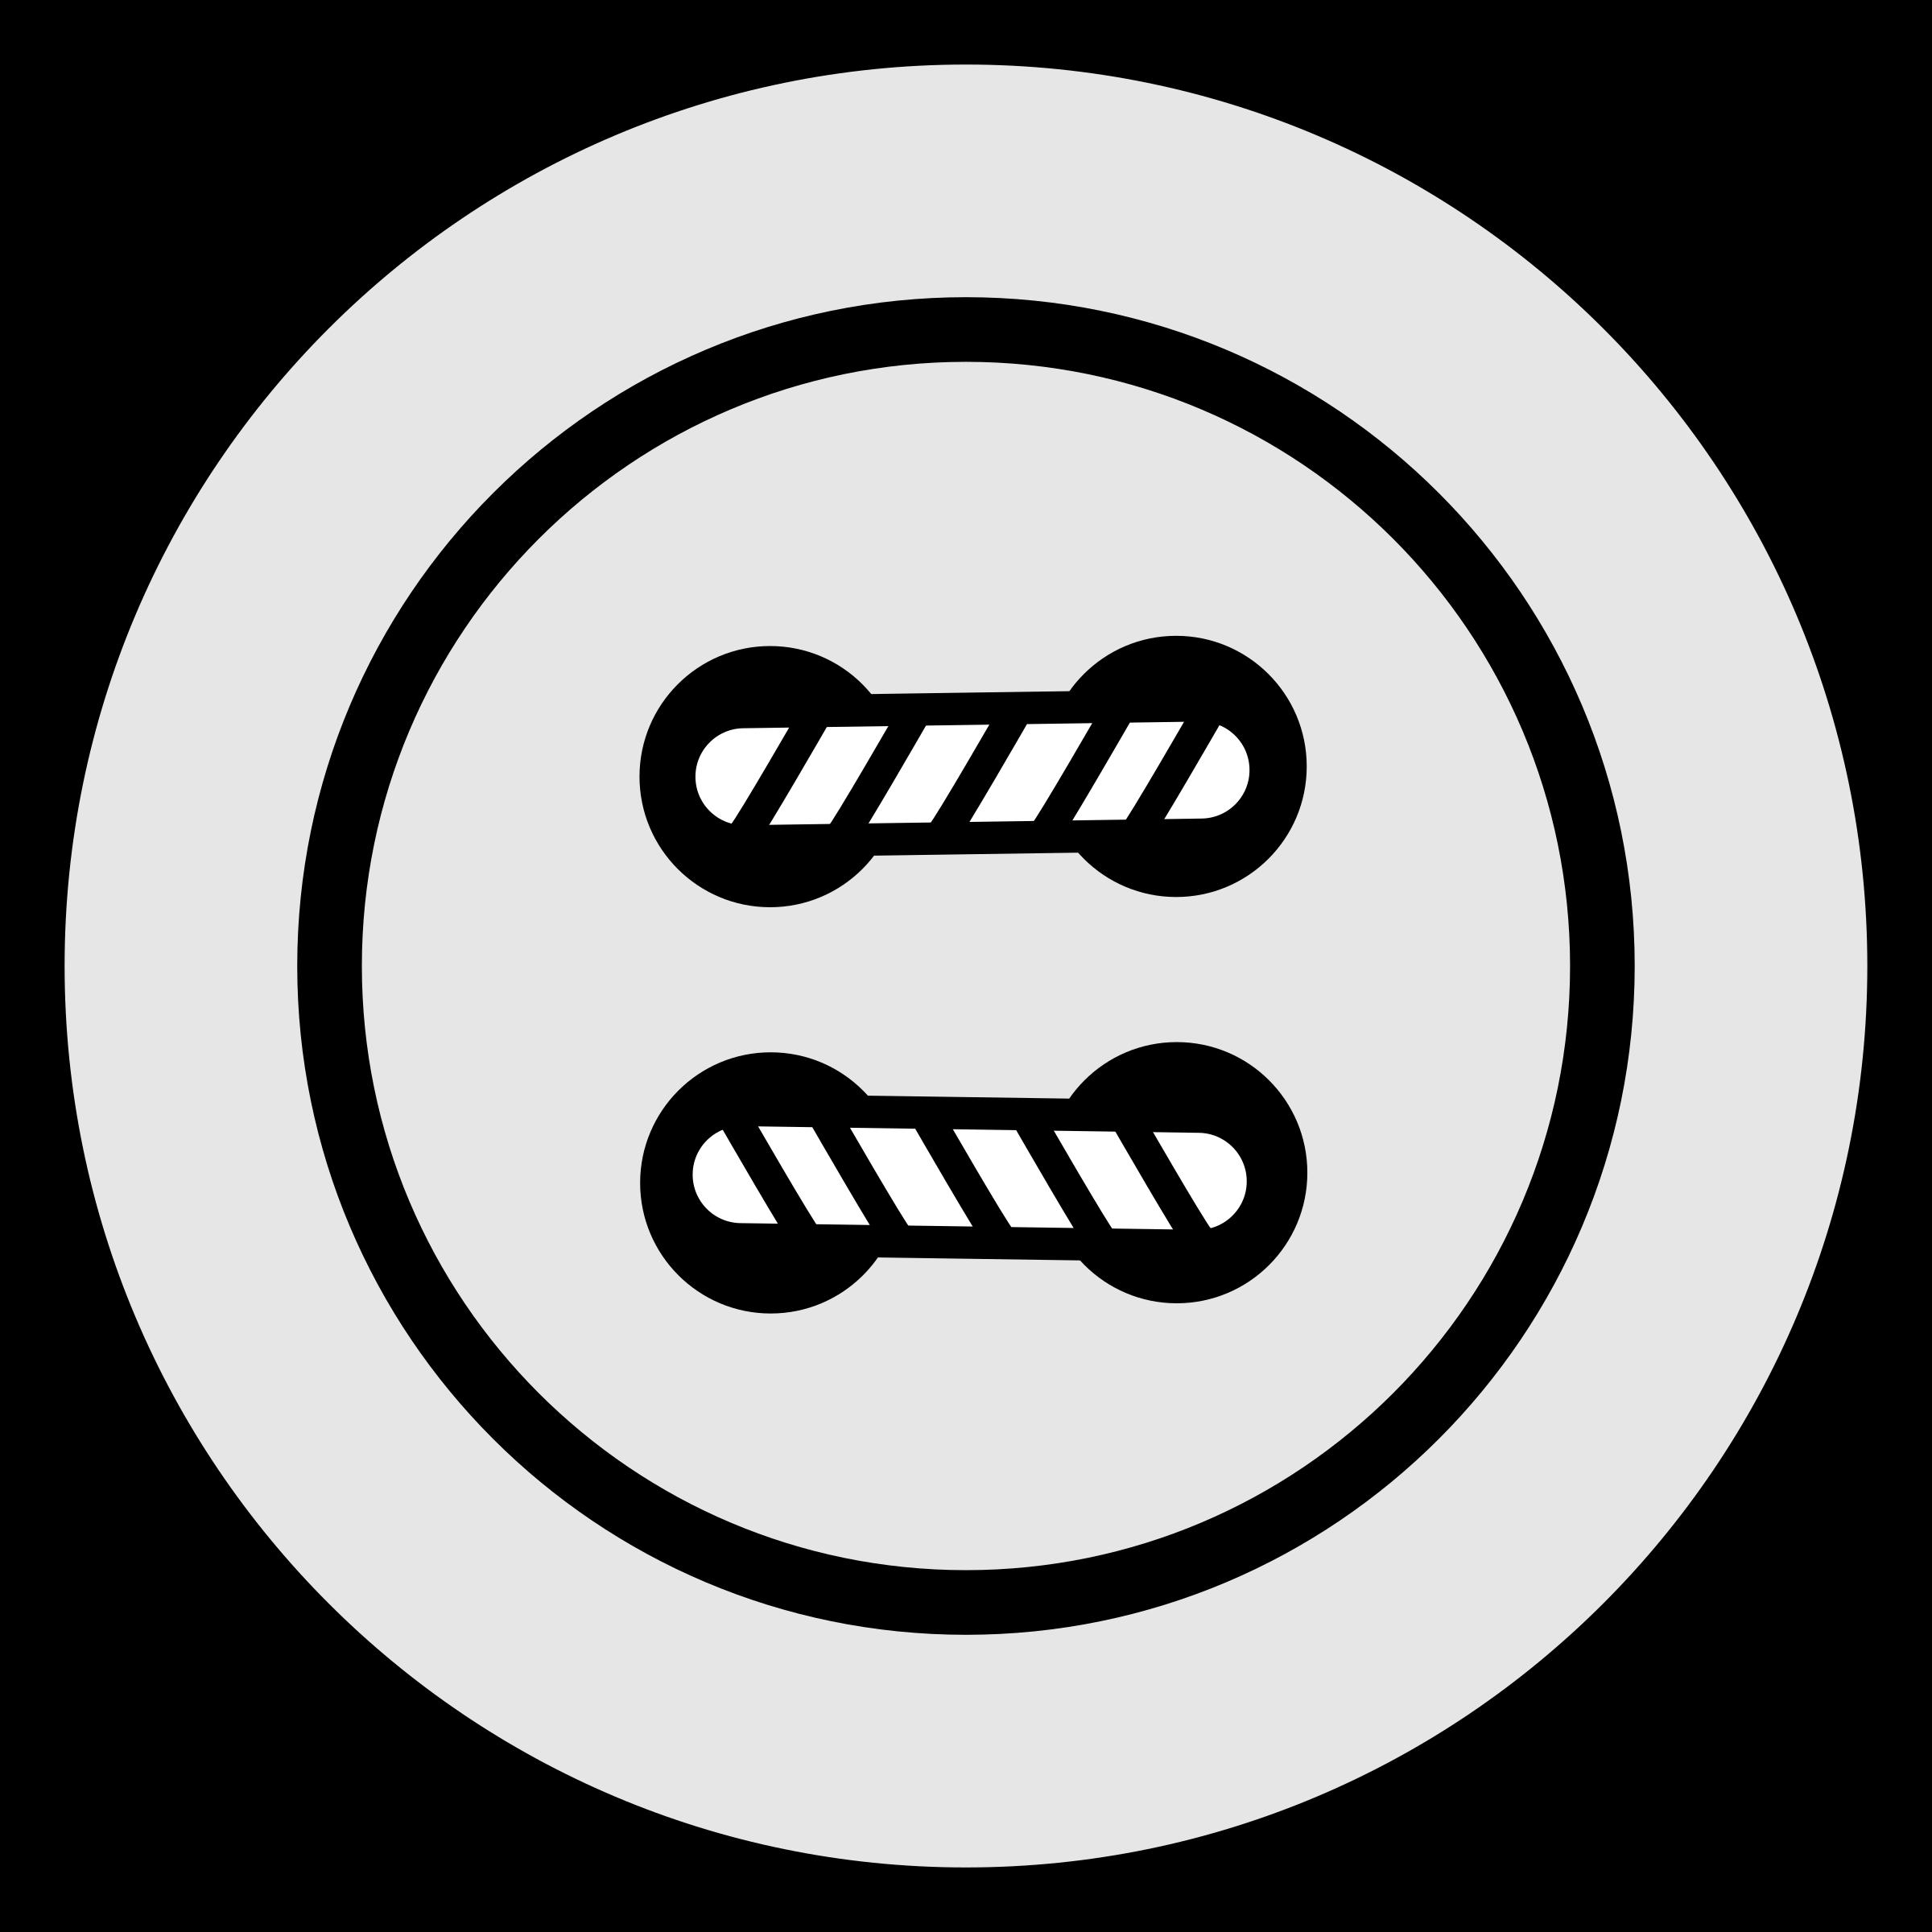 button clipart - 18 - j - Clipart simple 4h button ClipartBarn